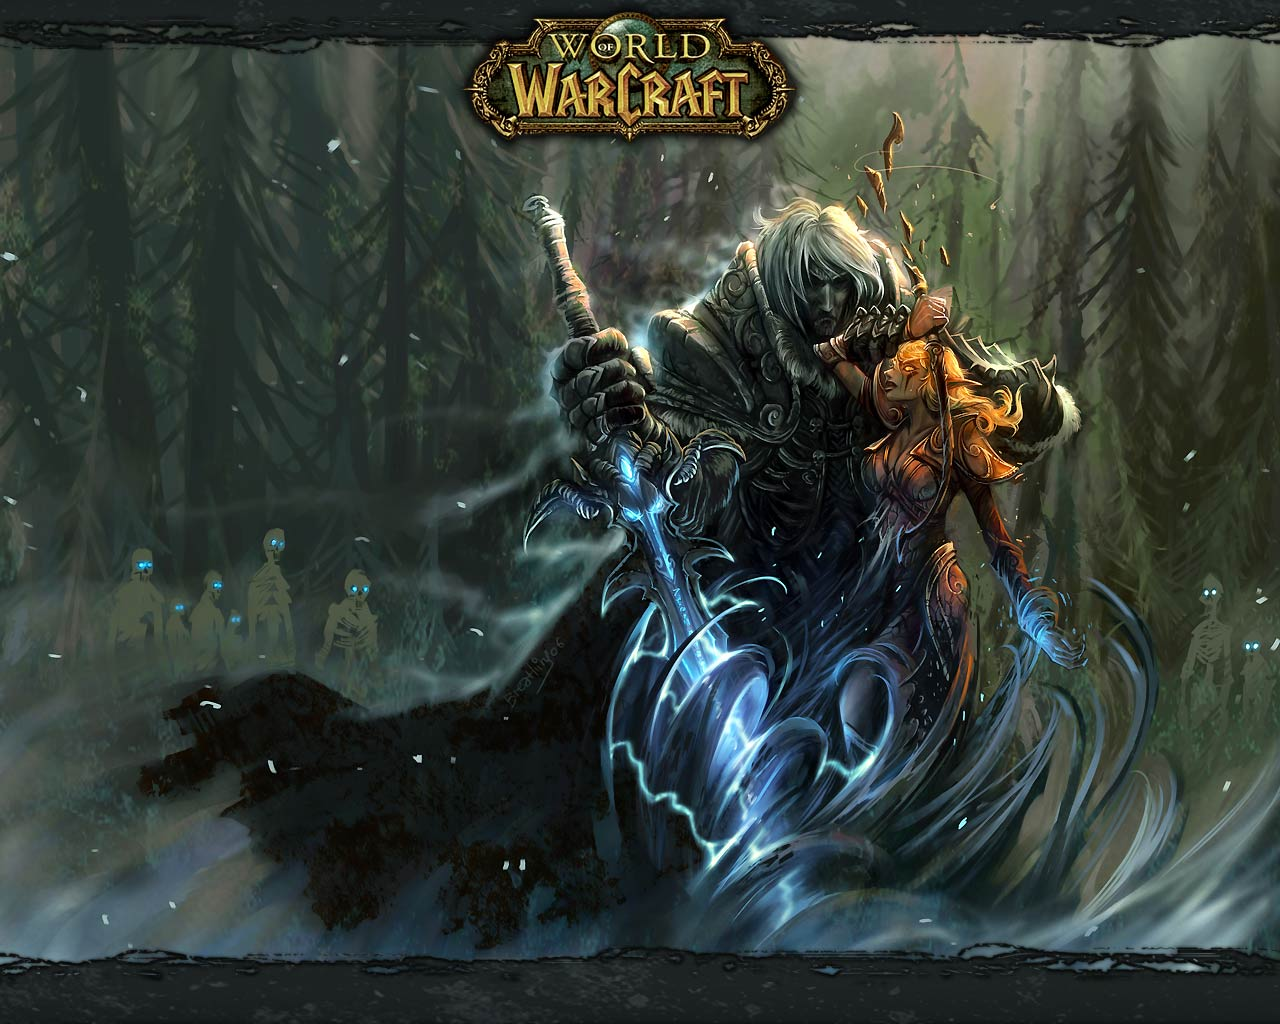 World Of Warcraft clipart computer game Wallpapers Pinterest Find Dekstop Warcraft